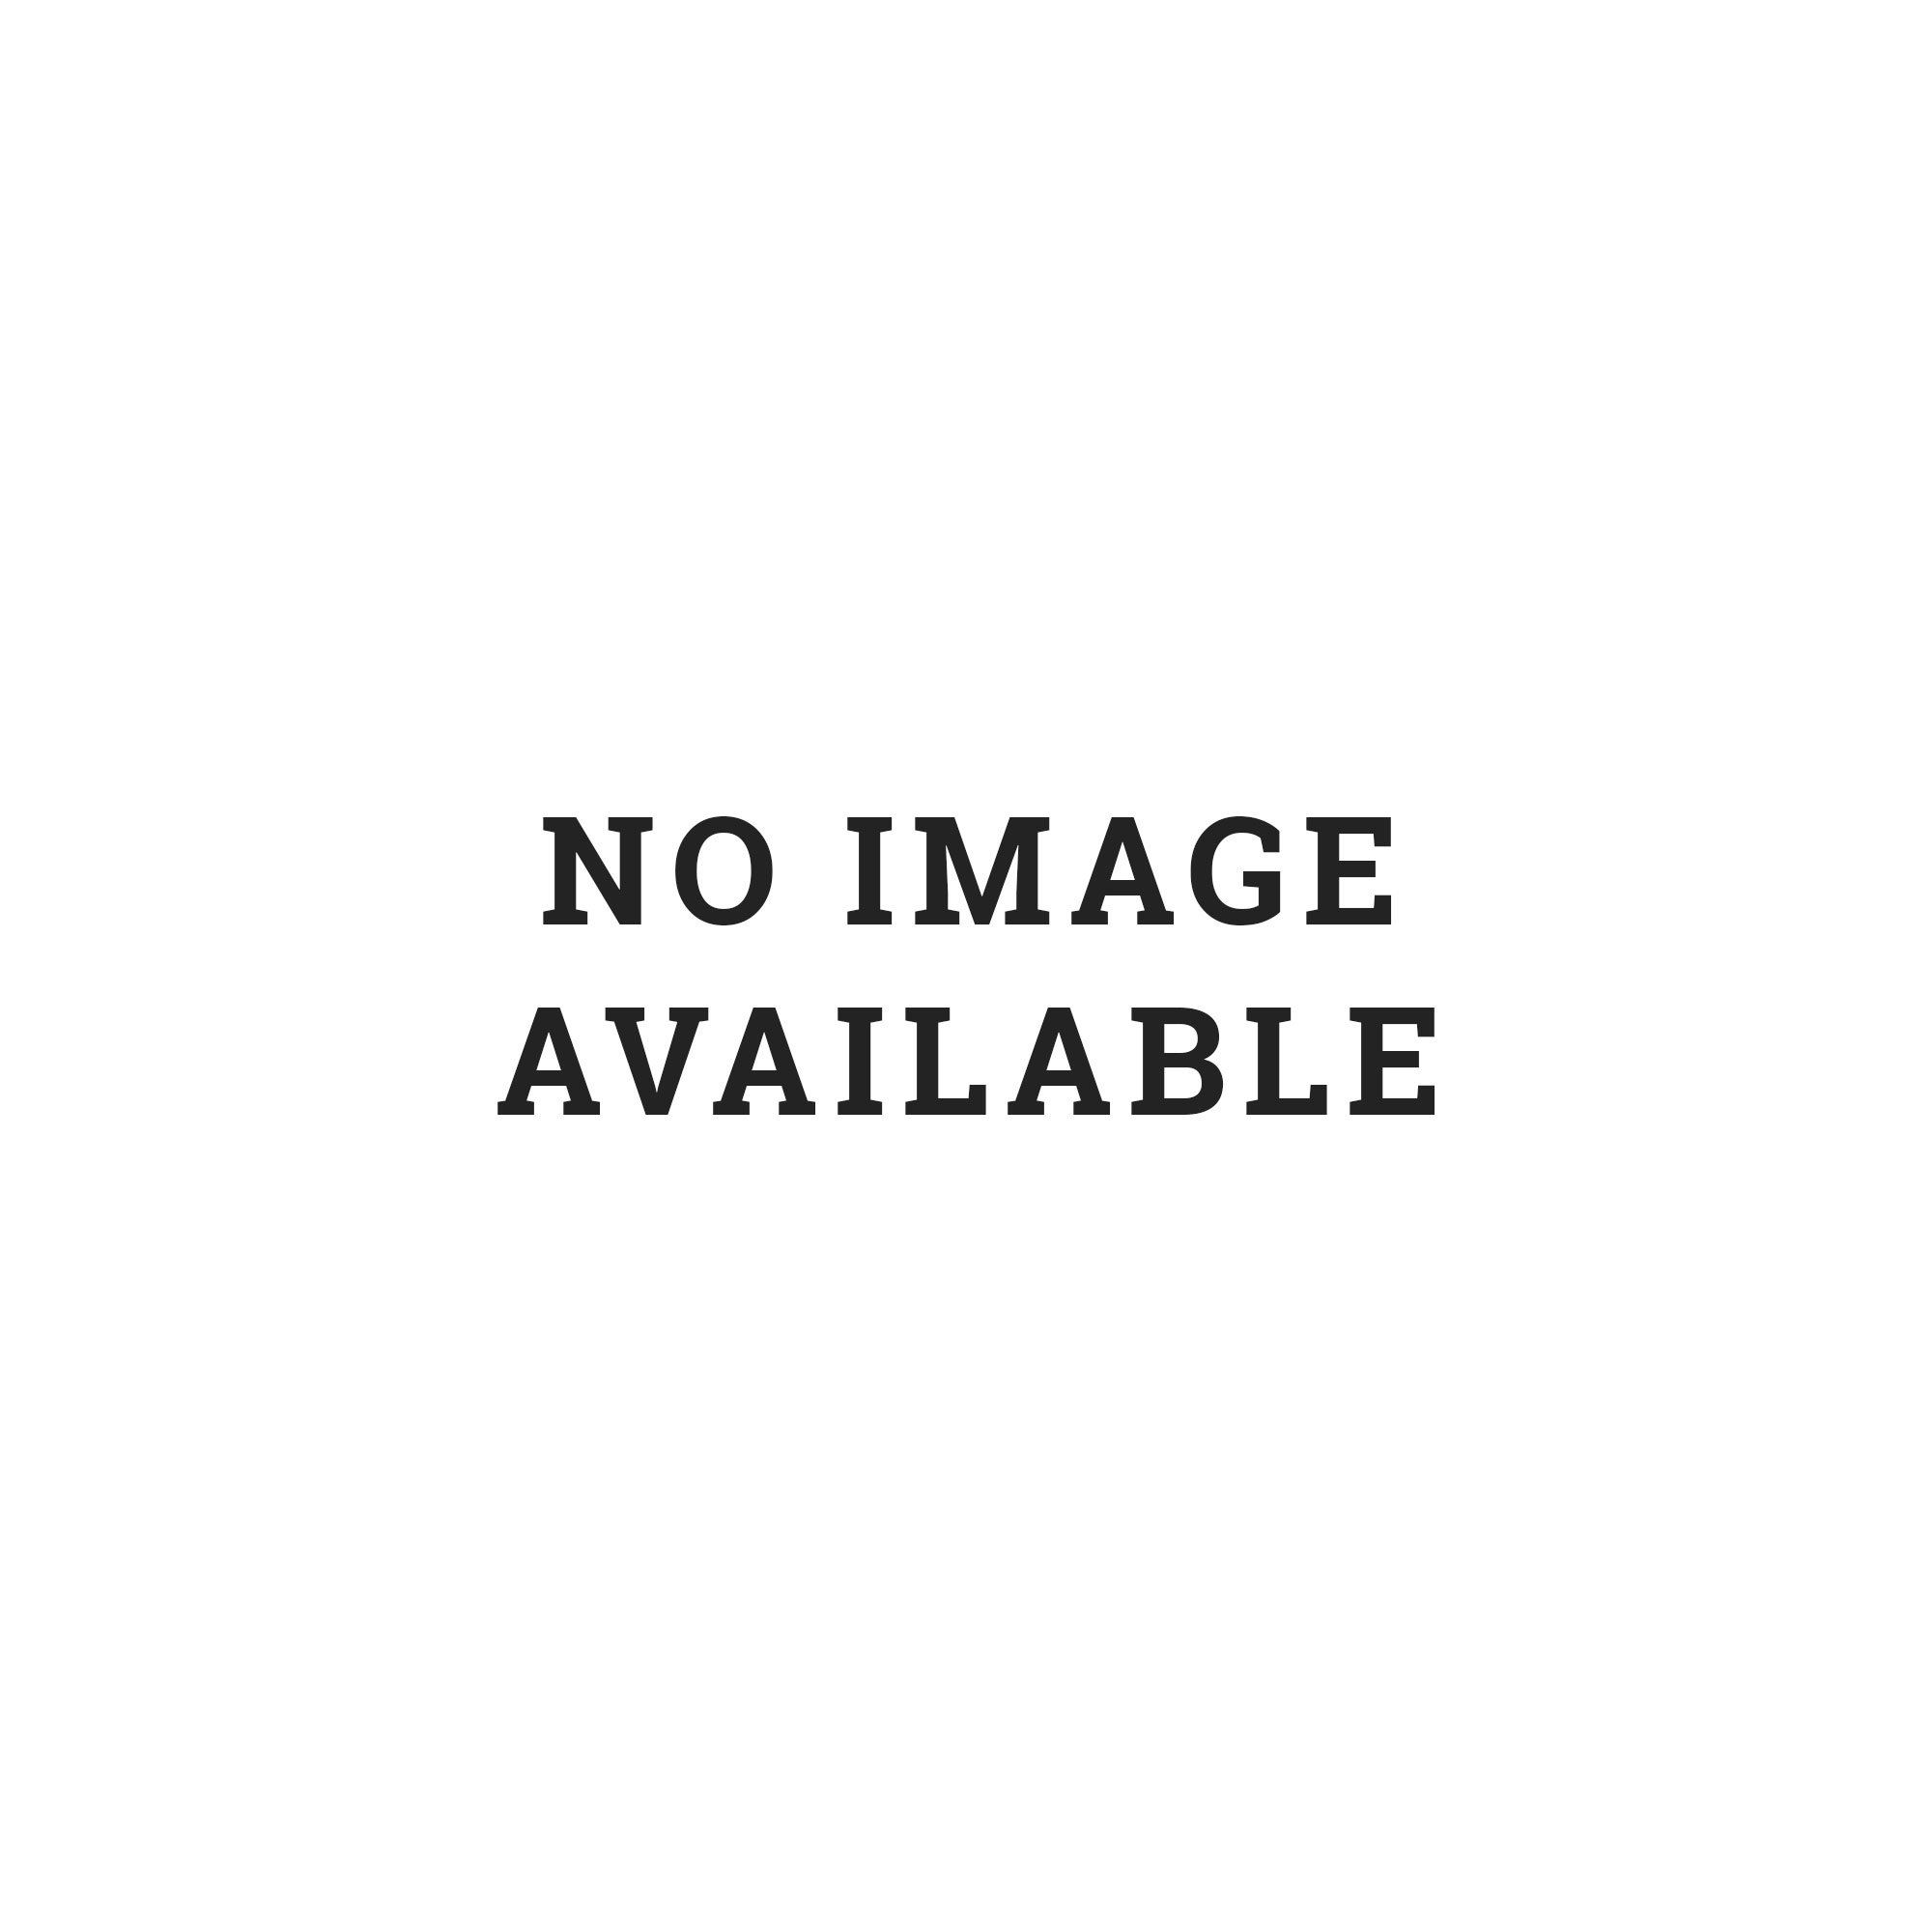 da45074f64df1b Vans VN0004PAIJU Sk8-Hi Lite Unisex Suede Skate Shoes - Black   White